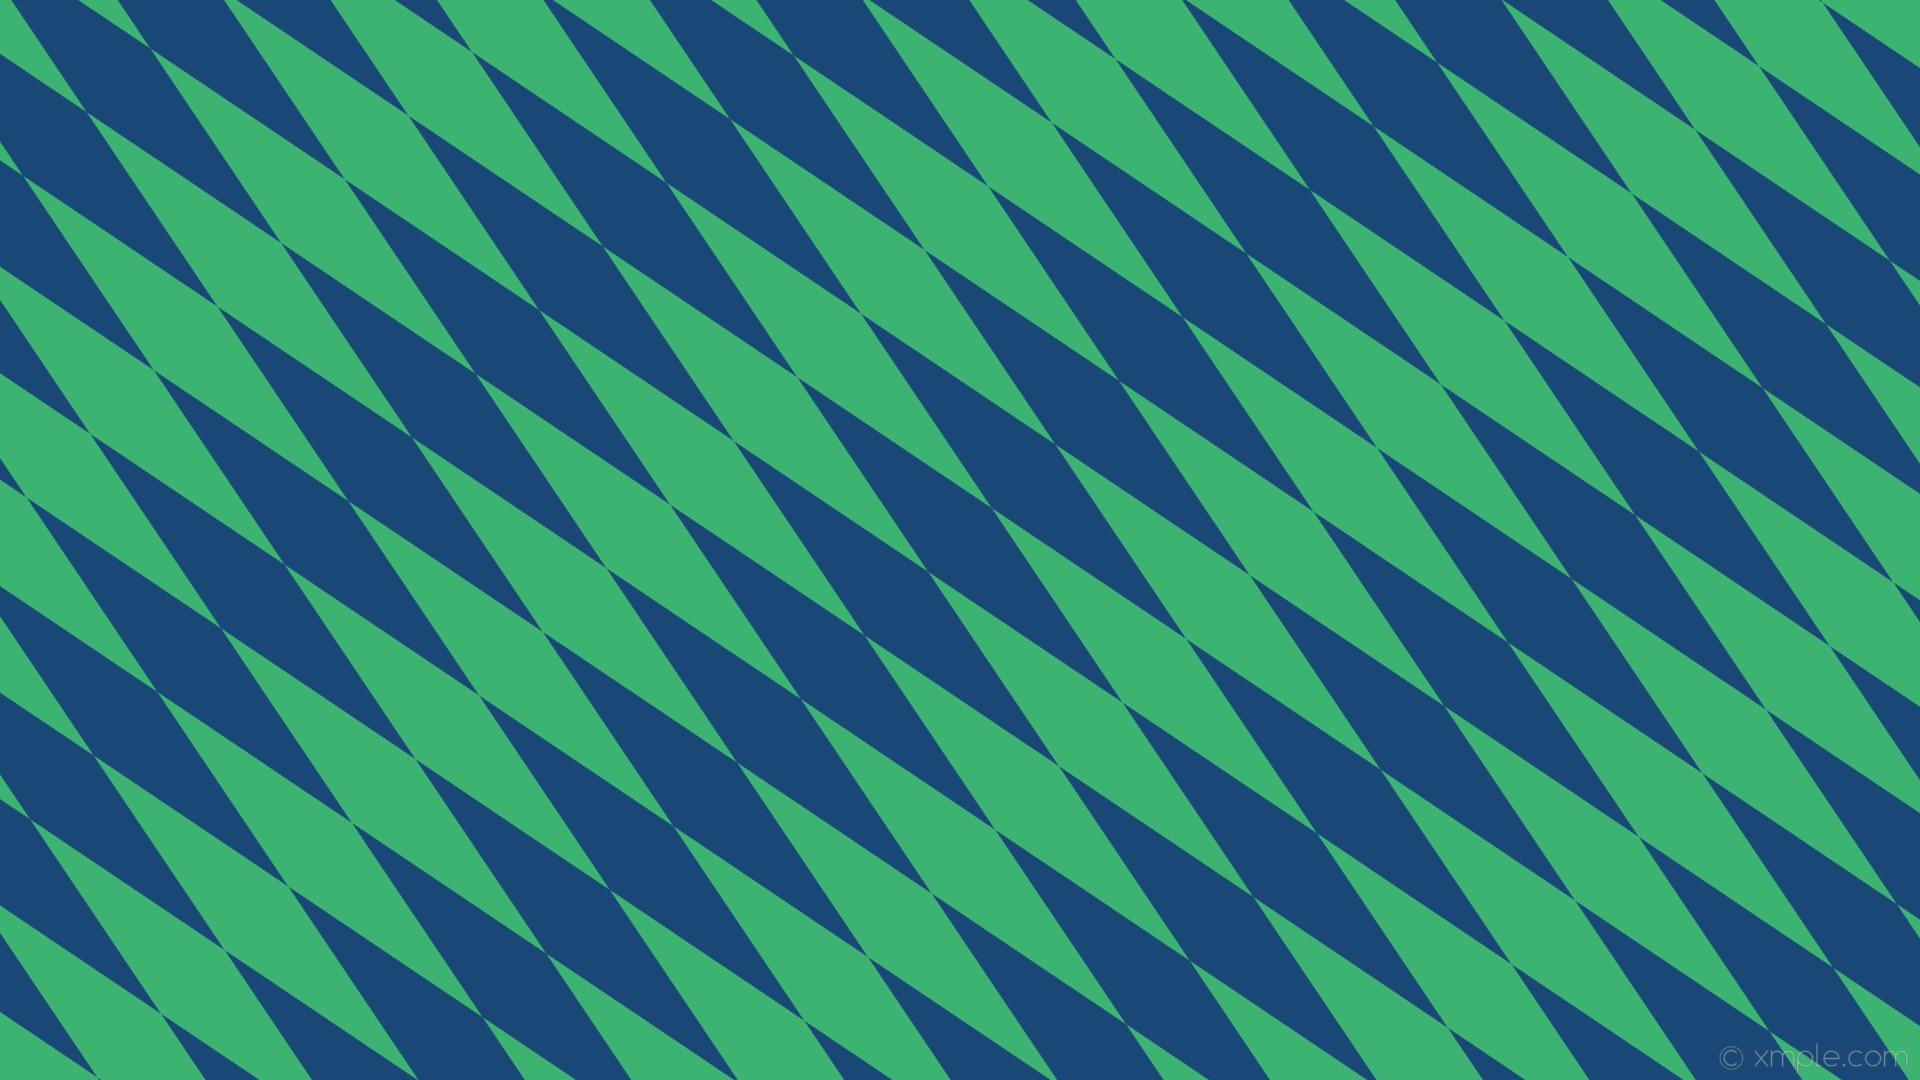 Wallpaper grid orange graph paper green #ff8c00 #3cb371 60° 3px 87px